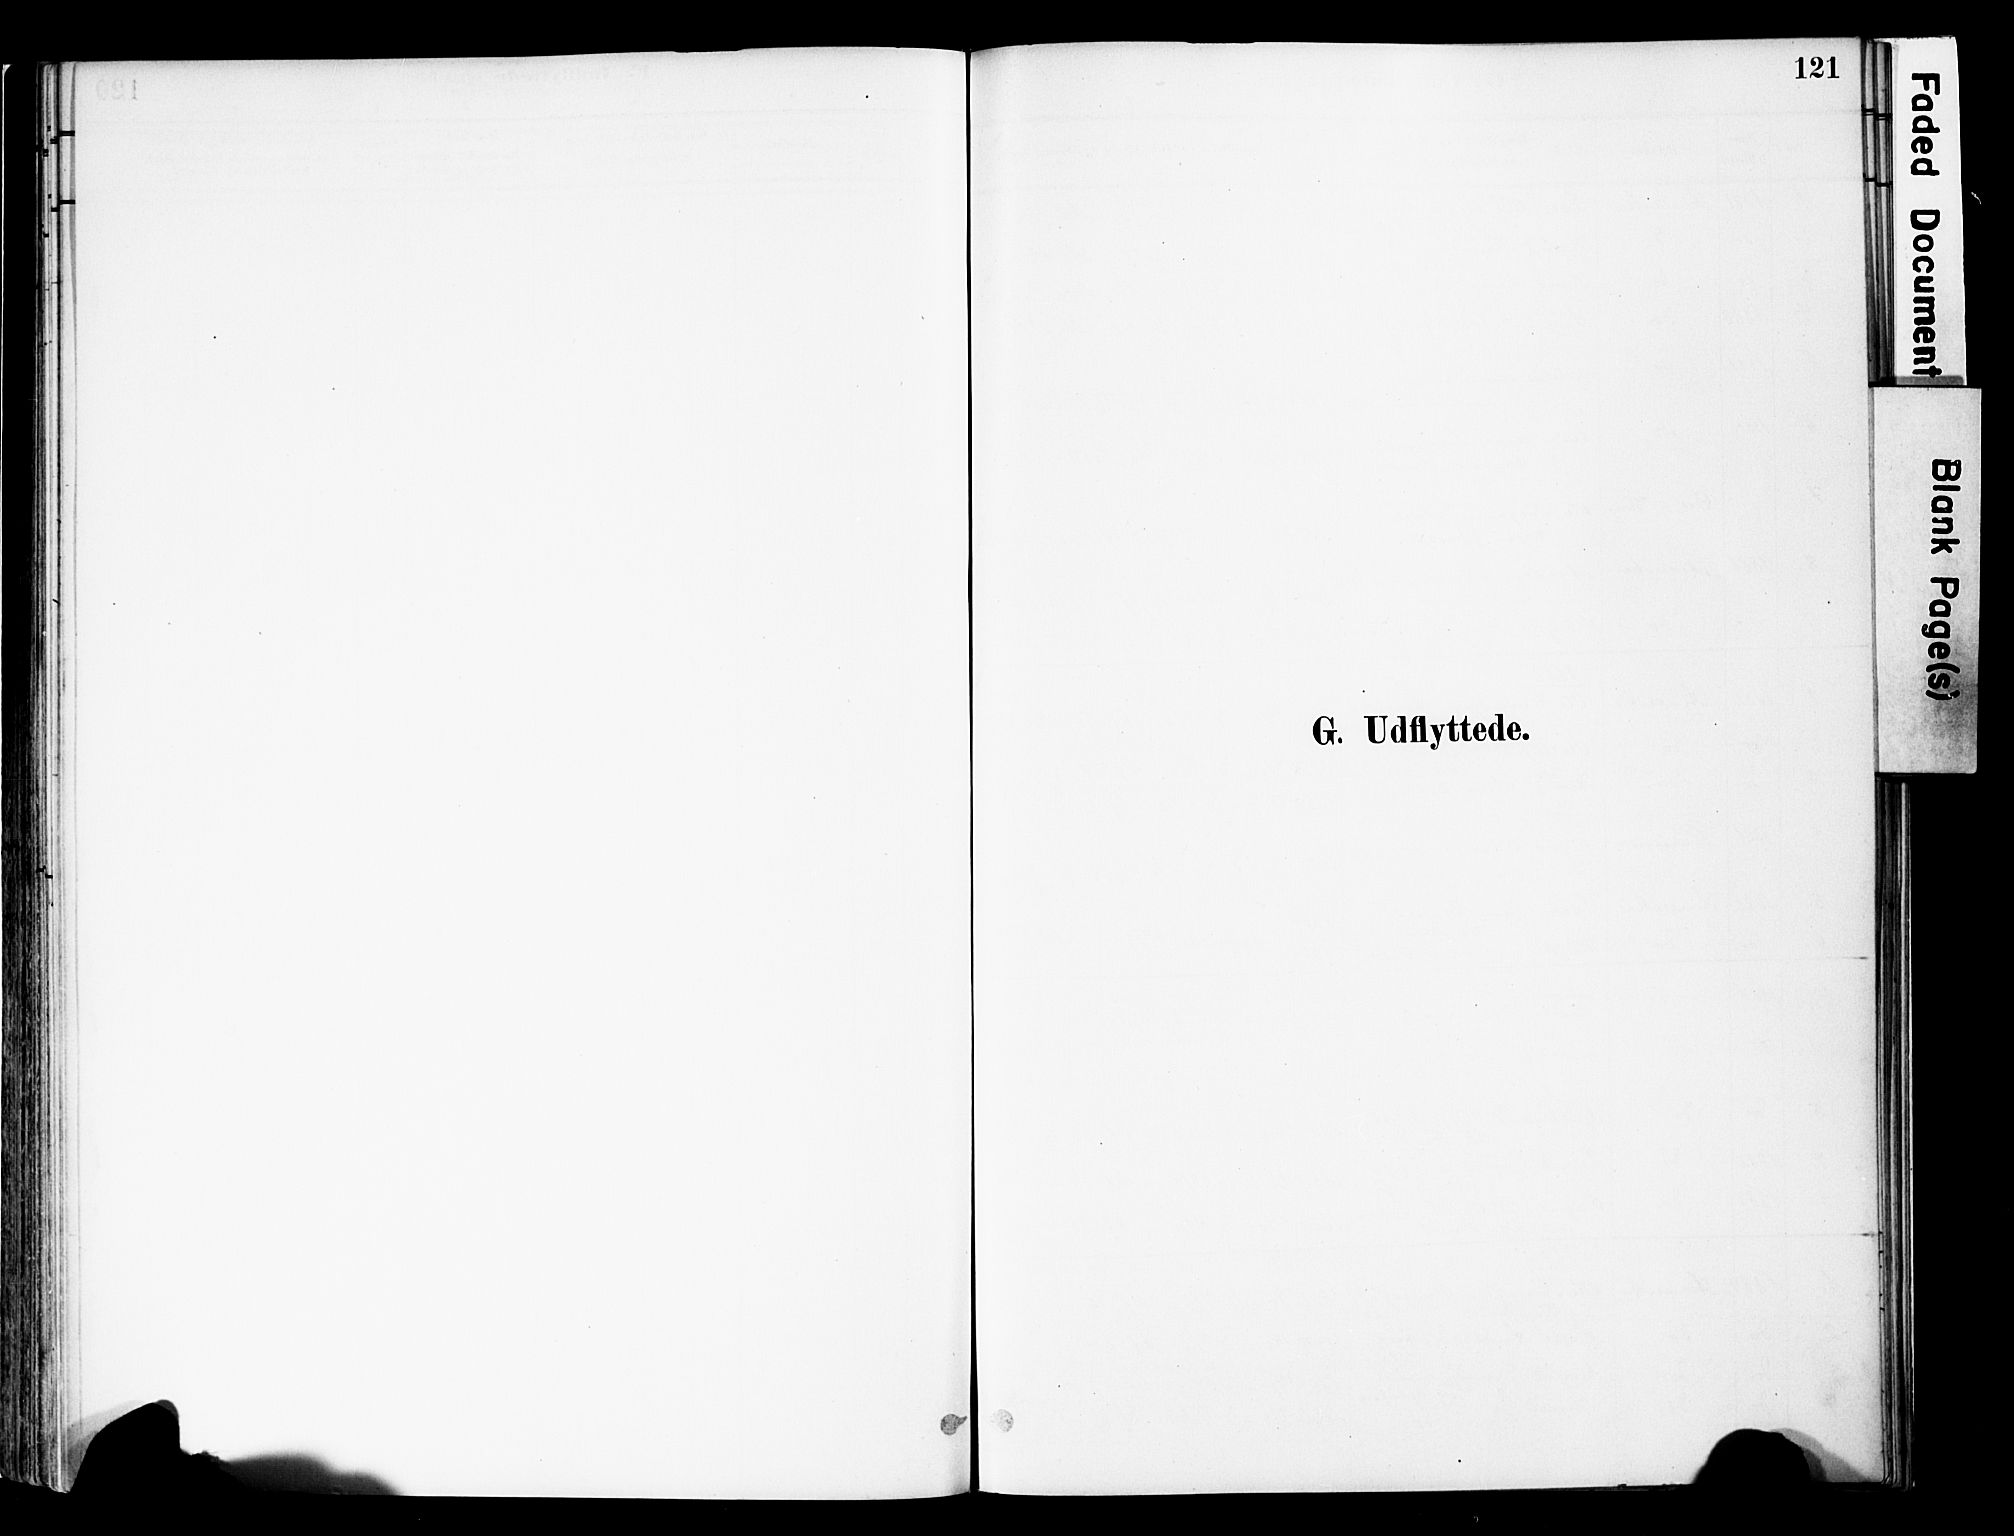 SAH, Vestre Slidre prestekontor, Ministerialbok nr. 5, 1881-1912, s. 121